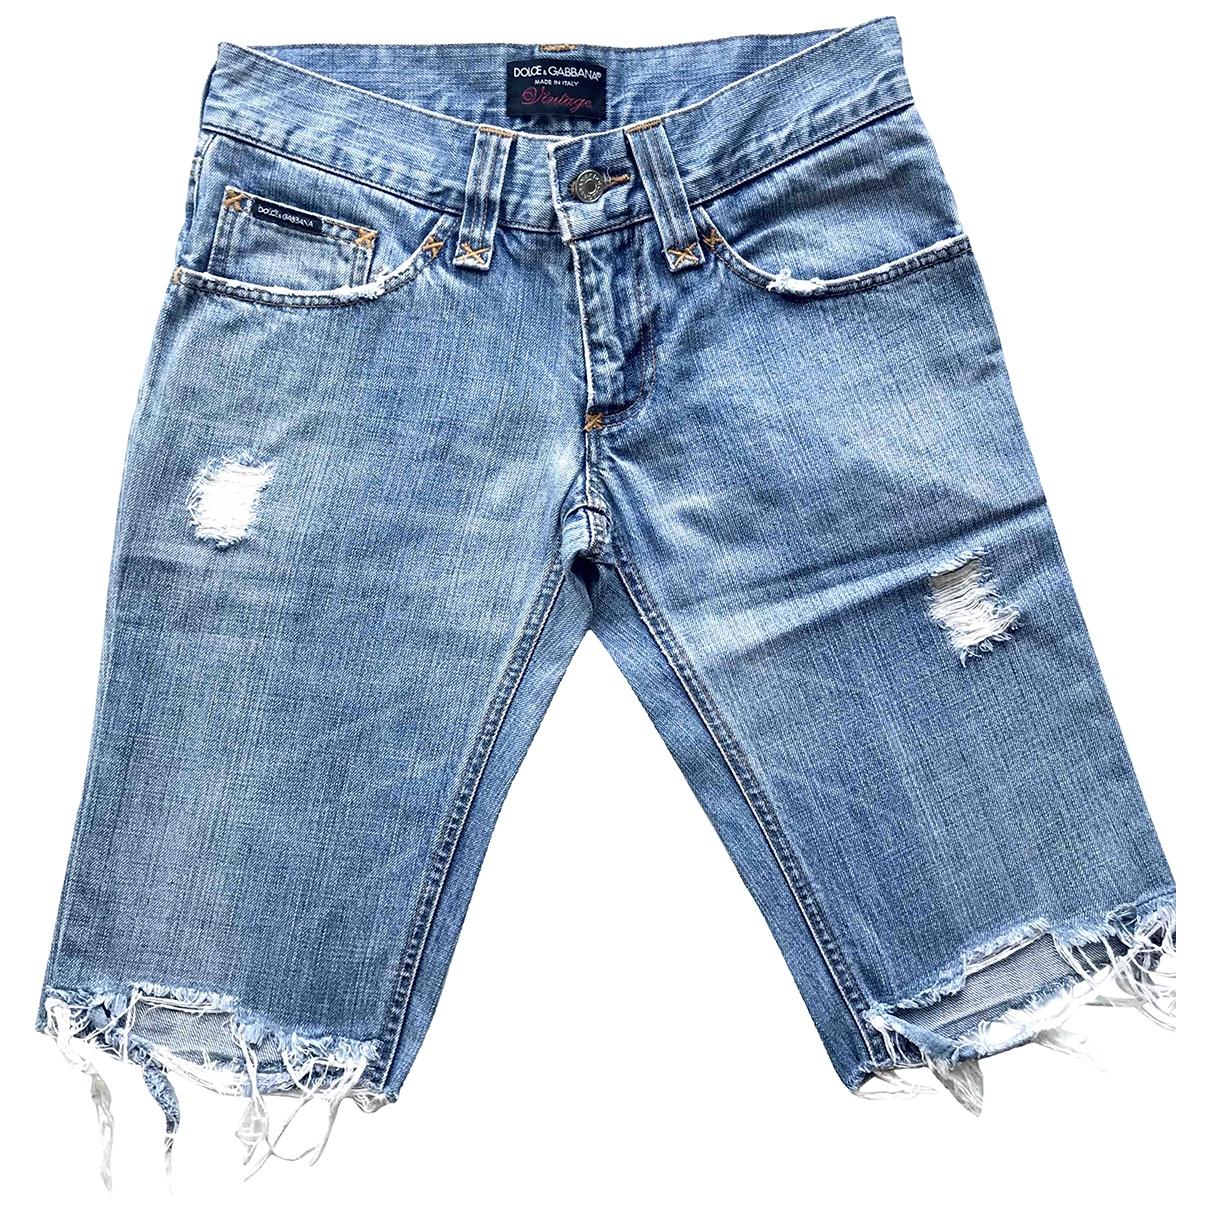 Pantalon corto Dolce & Gabbana